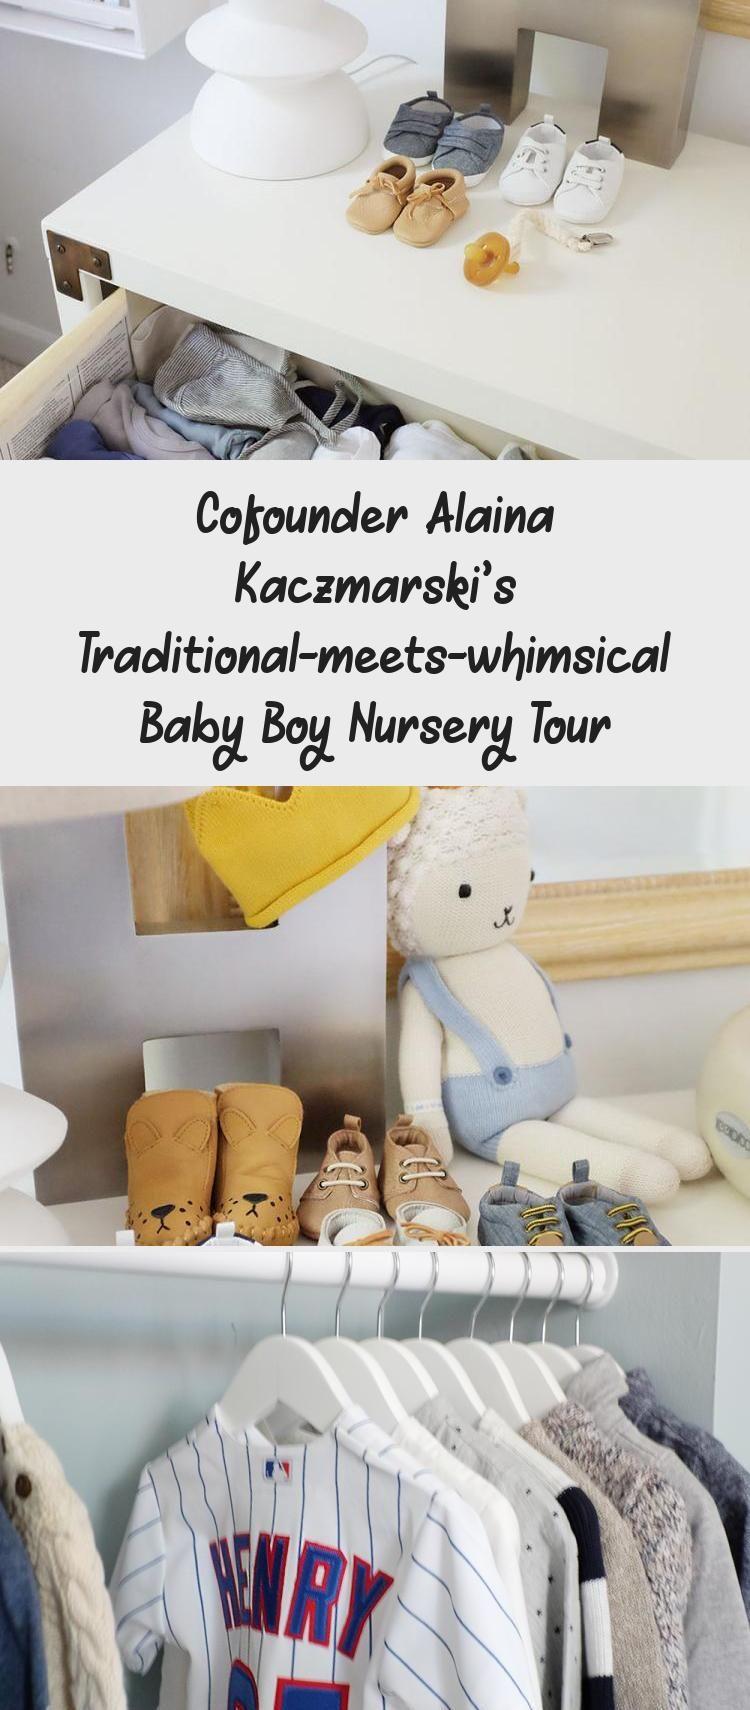 Photo of Cofounder Alaina Kaczmarski's Traditional-meets-whimsical Baby Boy Nursery Tour – Mother-Baby